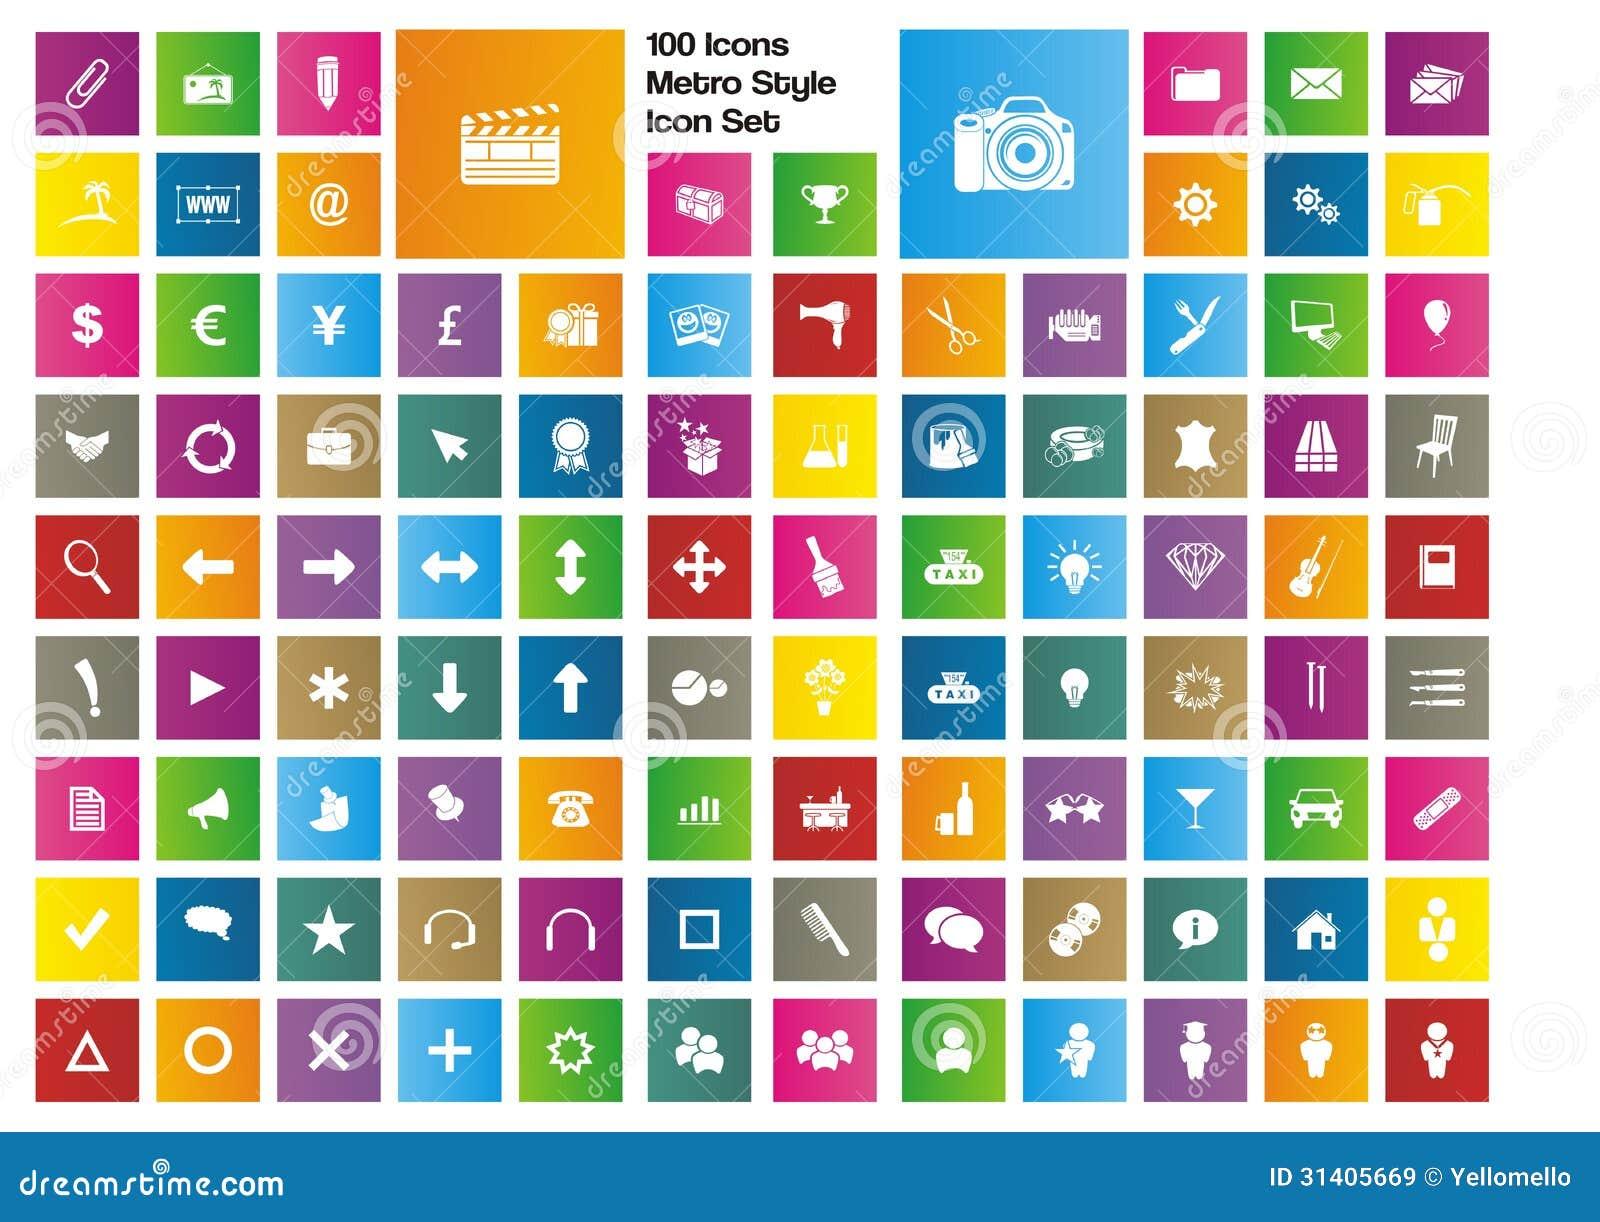 100 Icons Metro Style Icon Set Royalty Free Stock Images